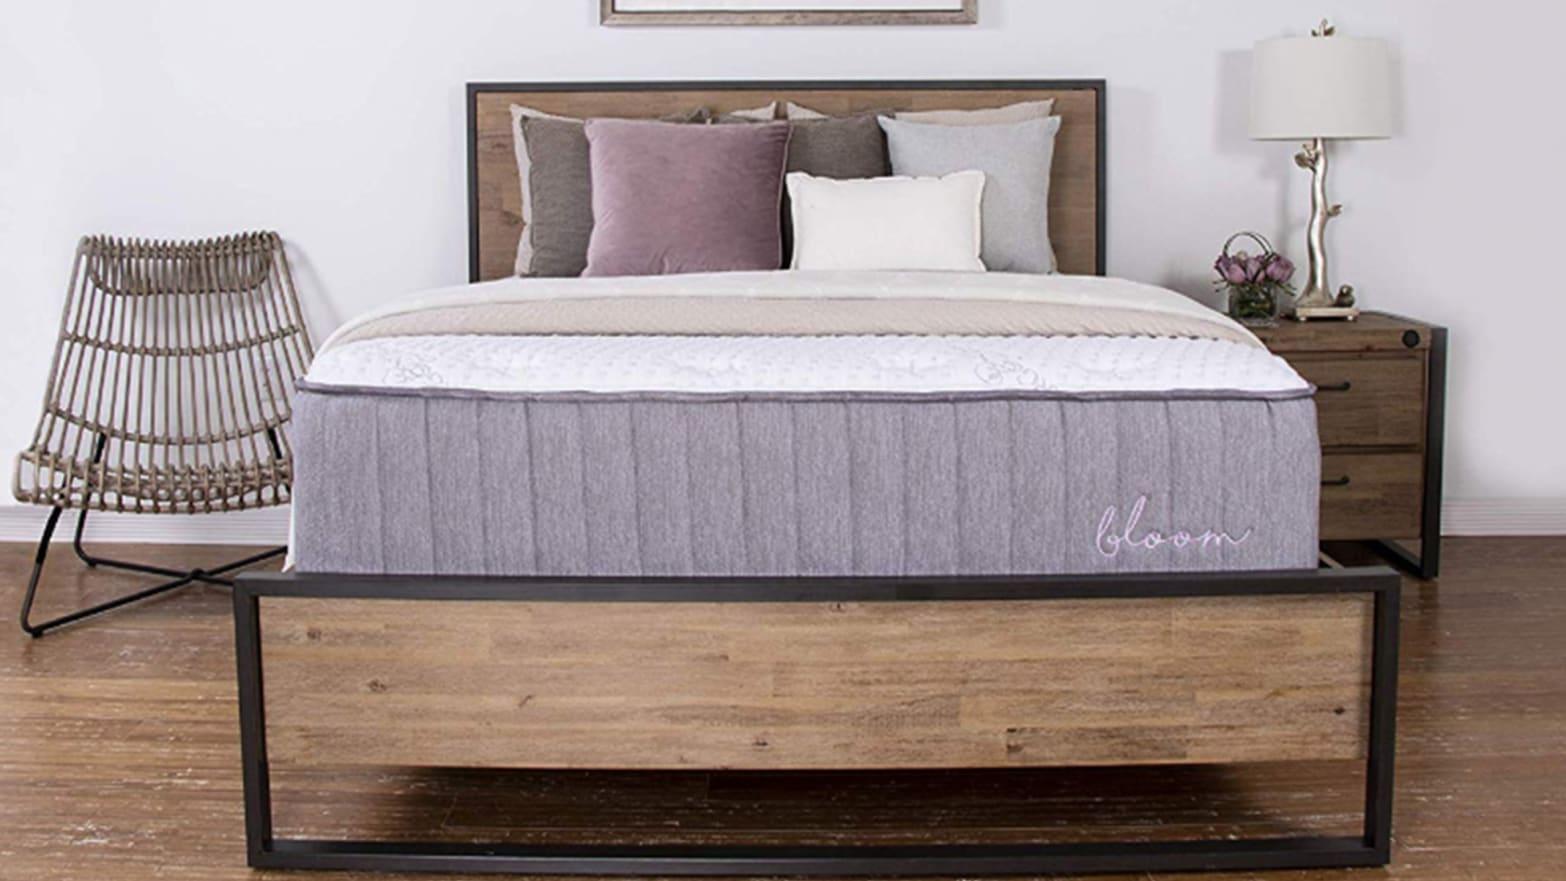 brooklyn bloom hybrid mattress review